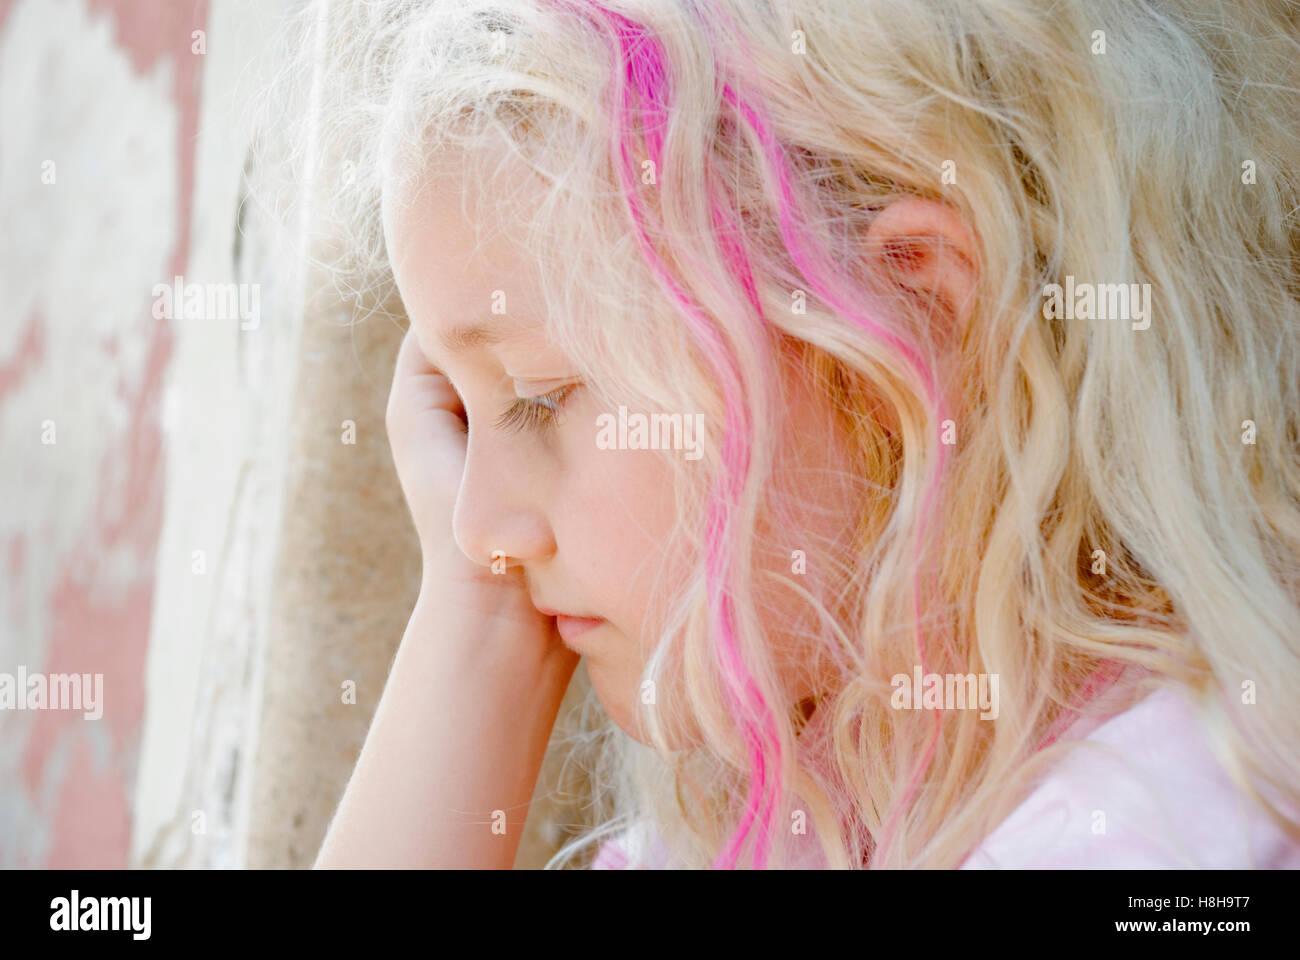 Sad 8 Year Old Girl Stock Photos Amp Sad 8 Year Old Girl